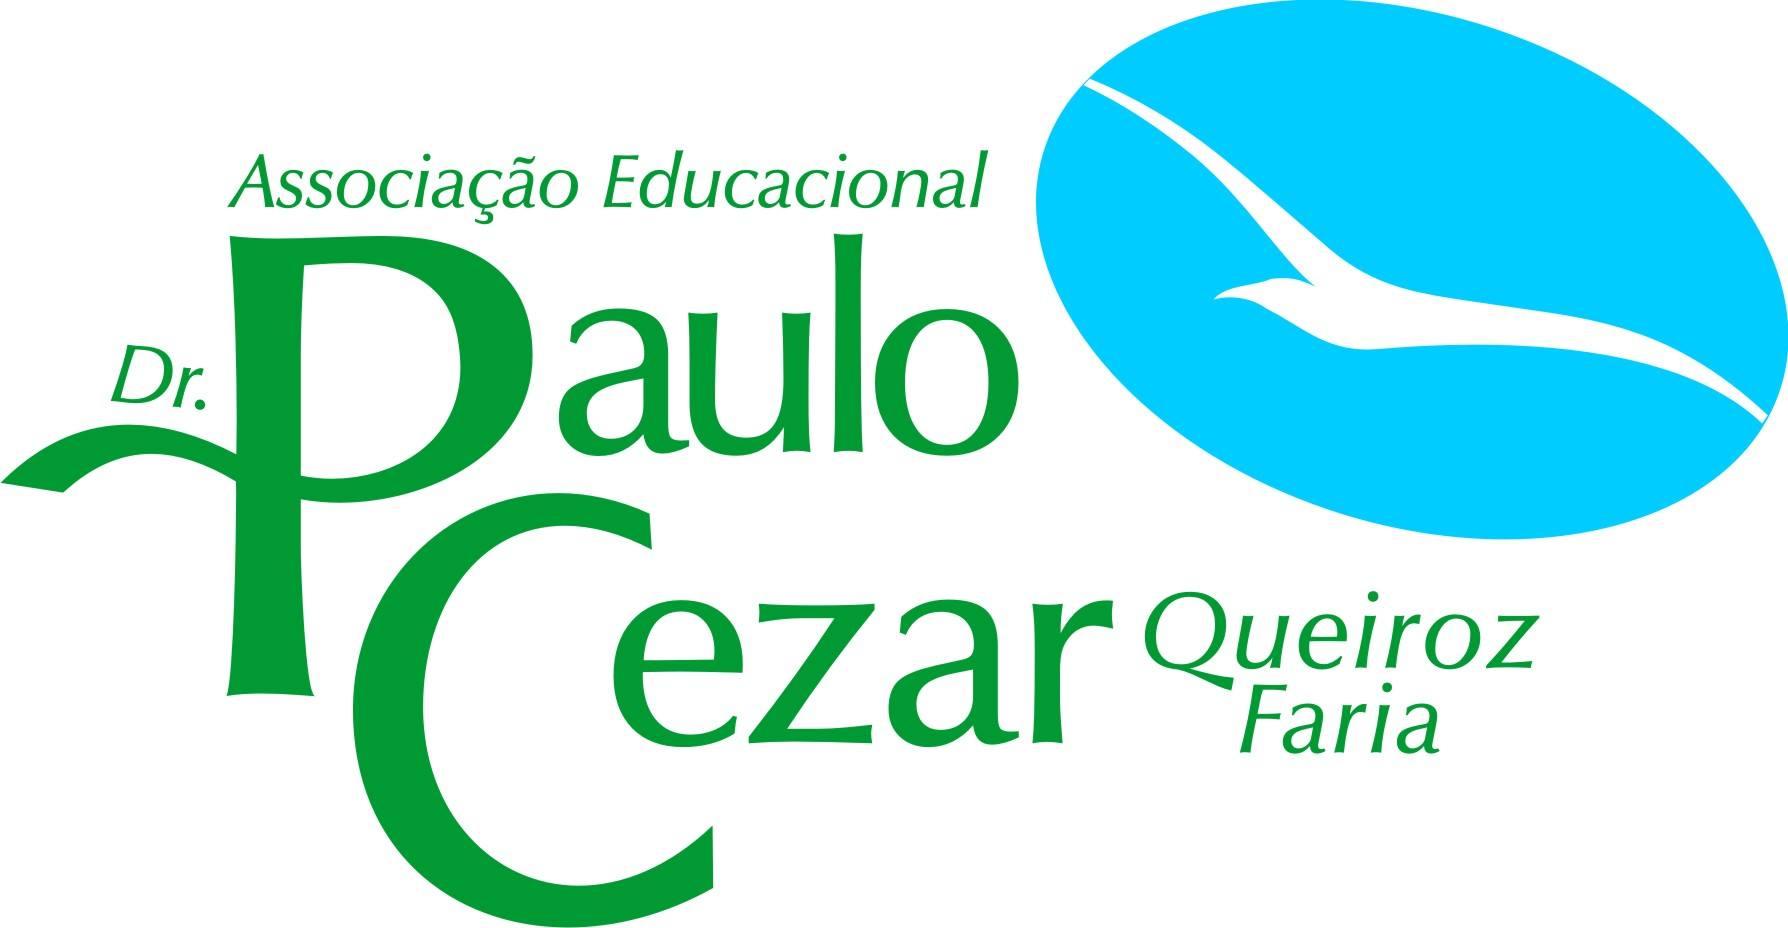 Colégio Dr. Paulo Cezar Queiroz Faria